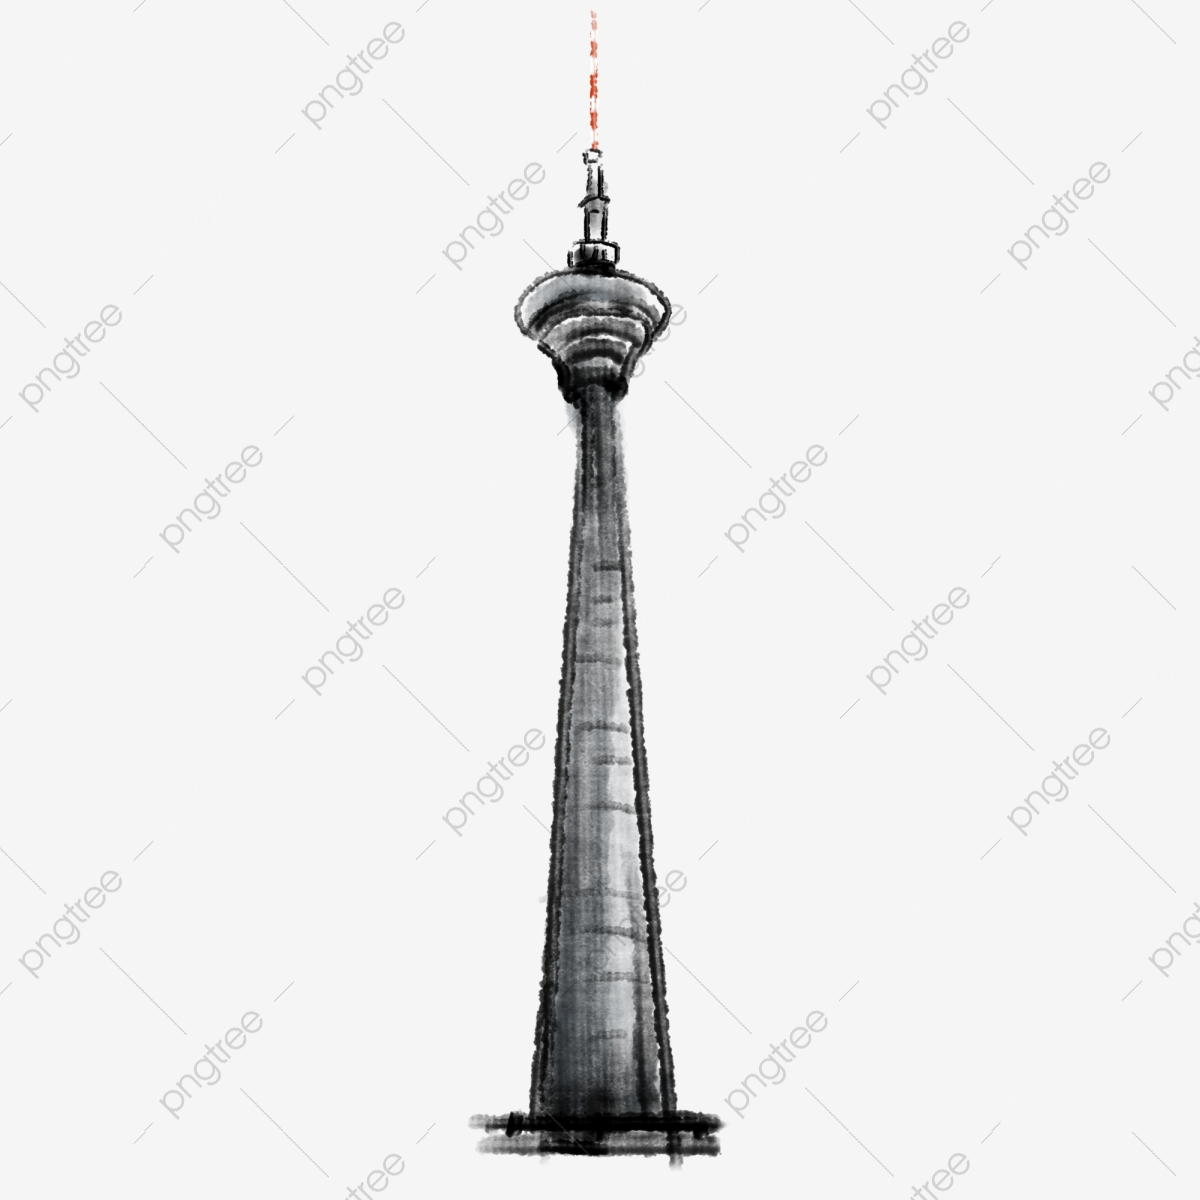 Radio Tower, Radio Clipart, Electric Tower, Radio PNG